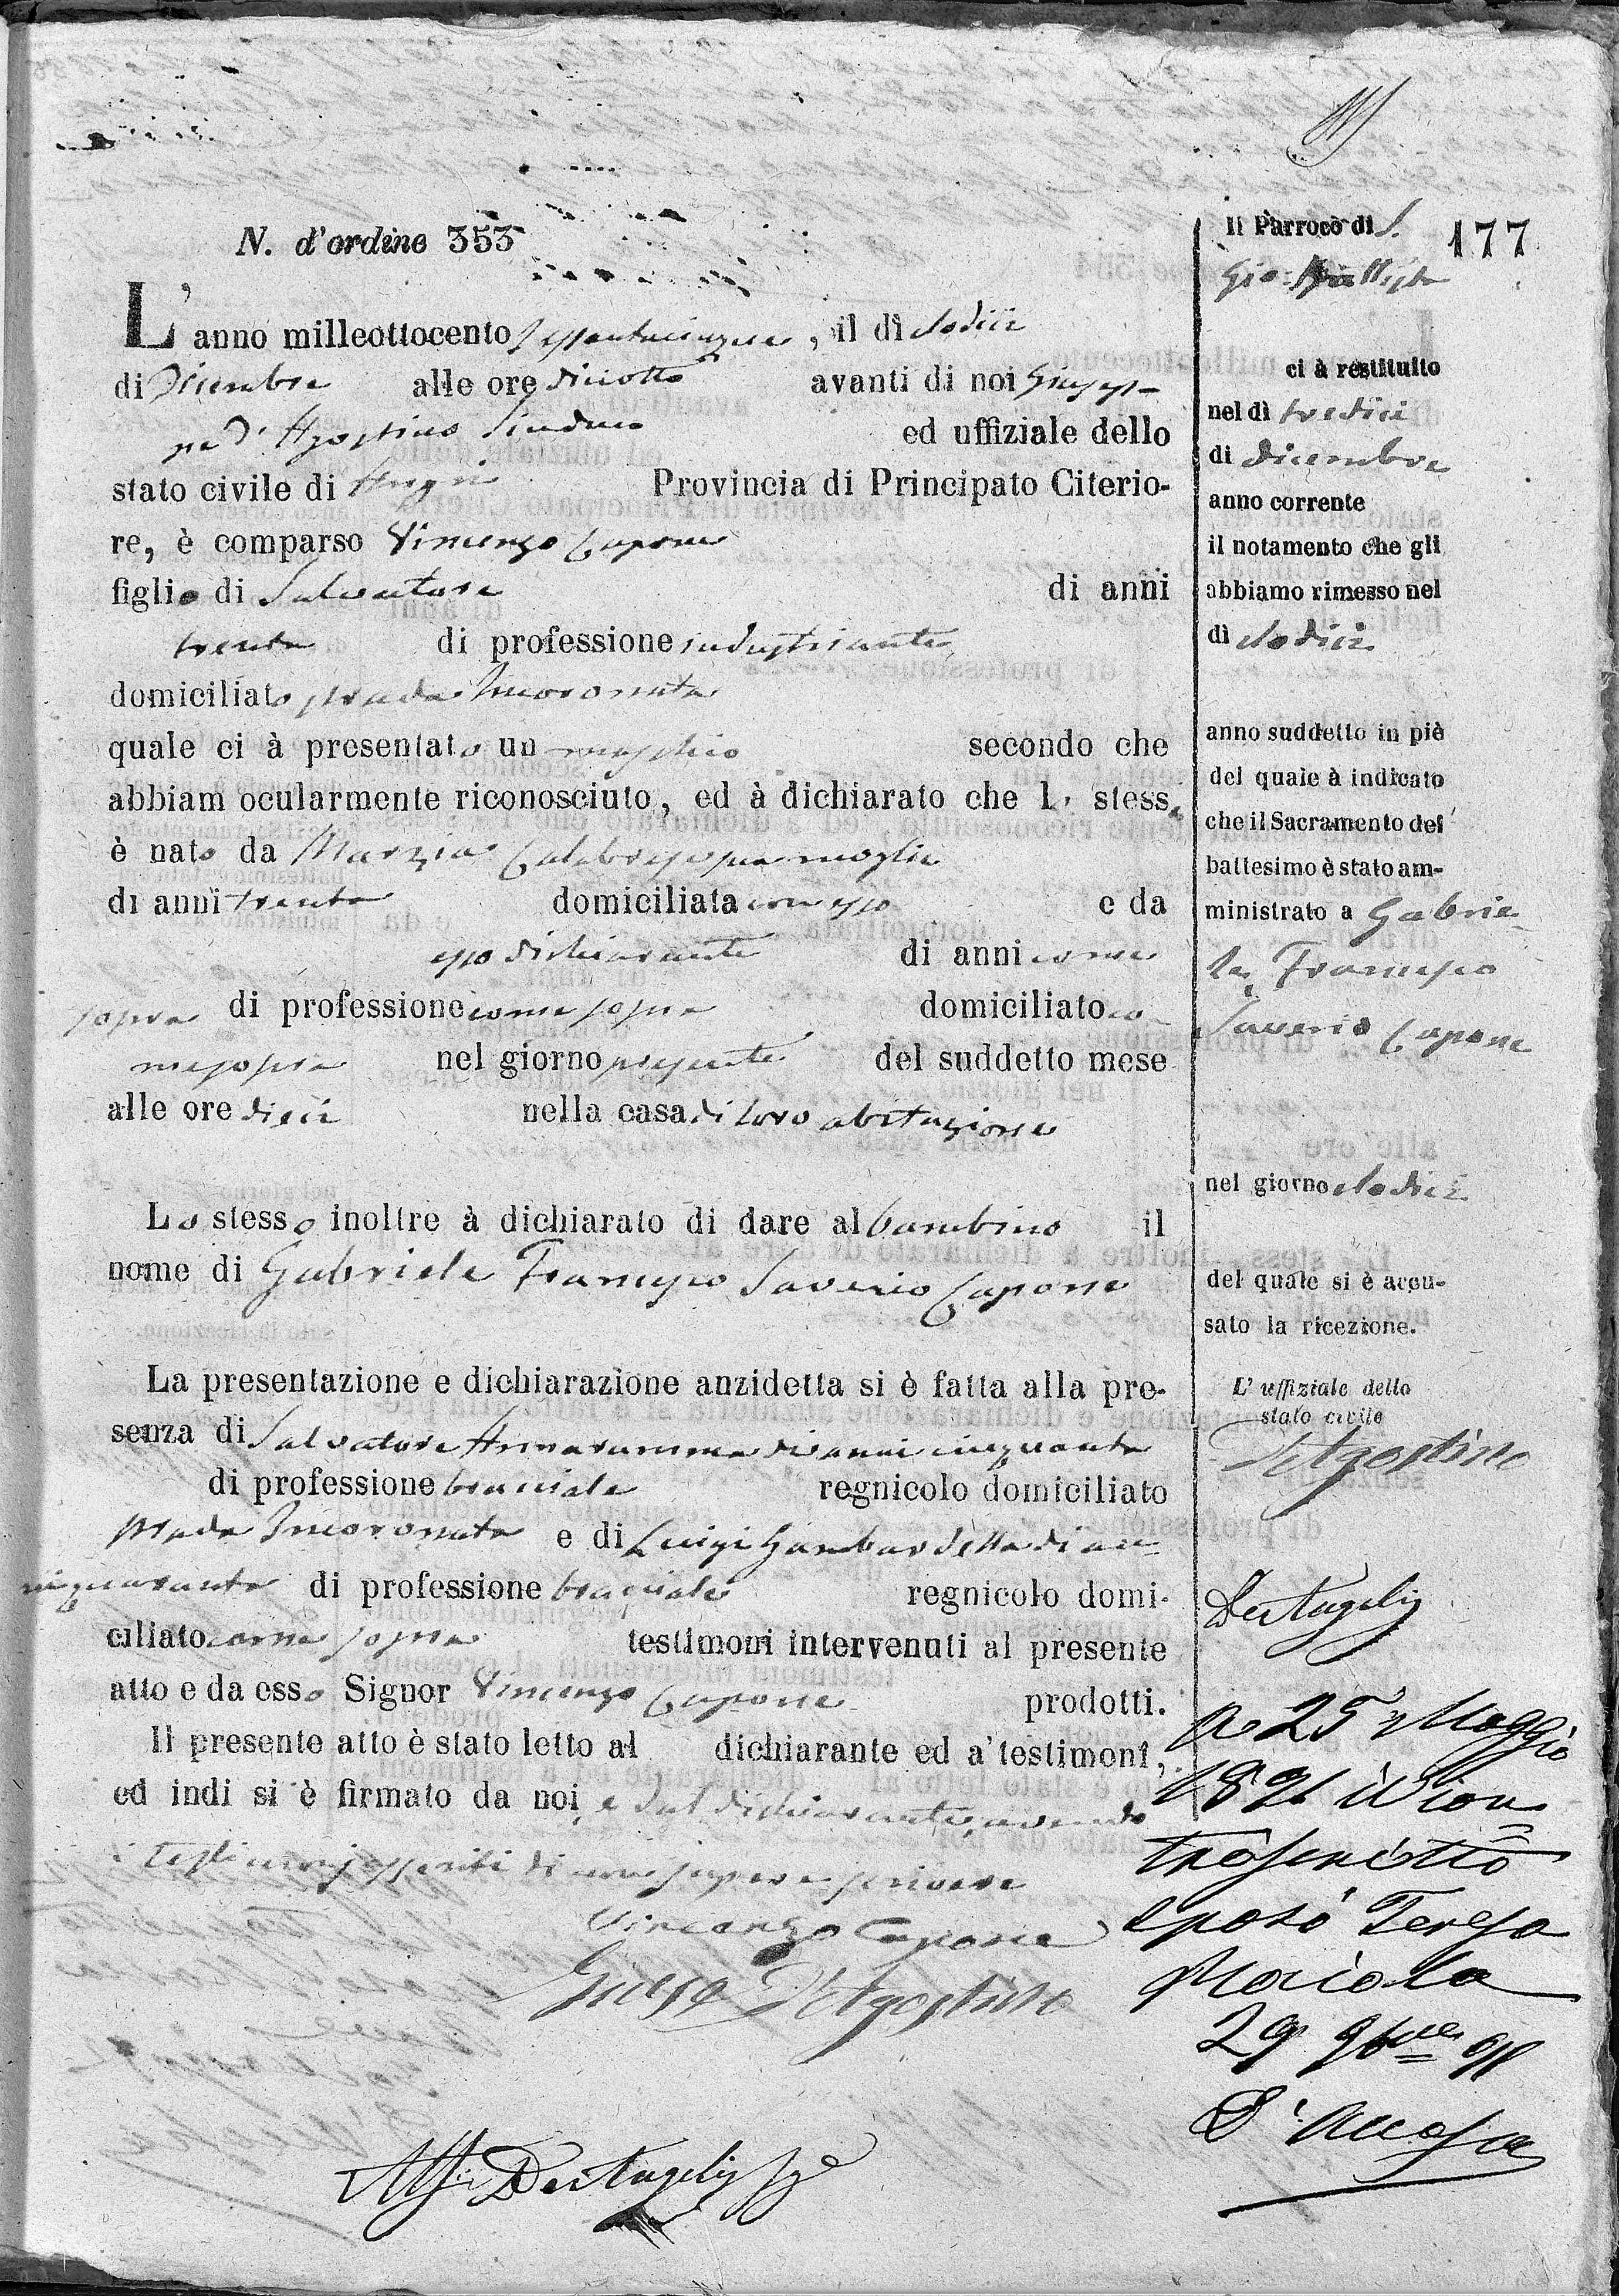 http://www.genealogiafamiliare.it/wp/wp-content/uploads/2018/03/Nascita-Padre.jpg